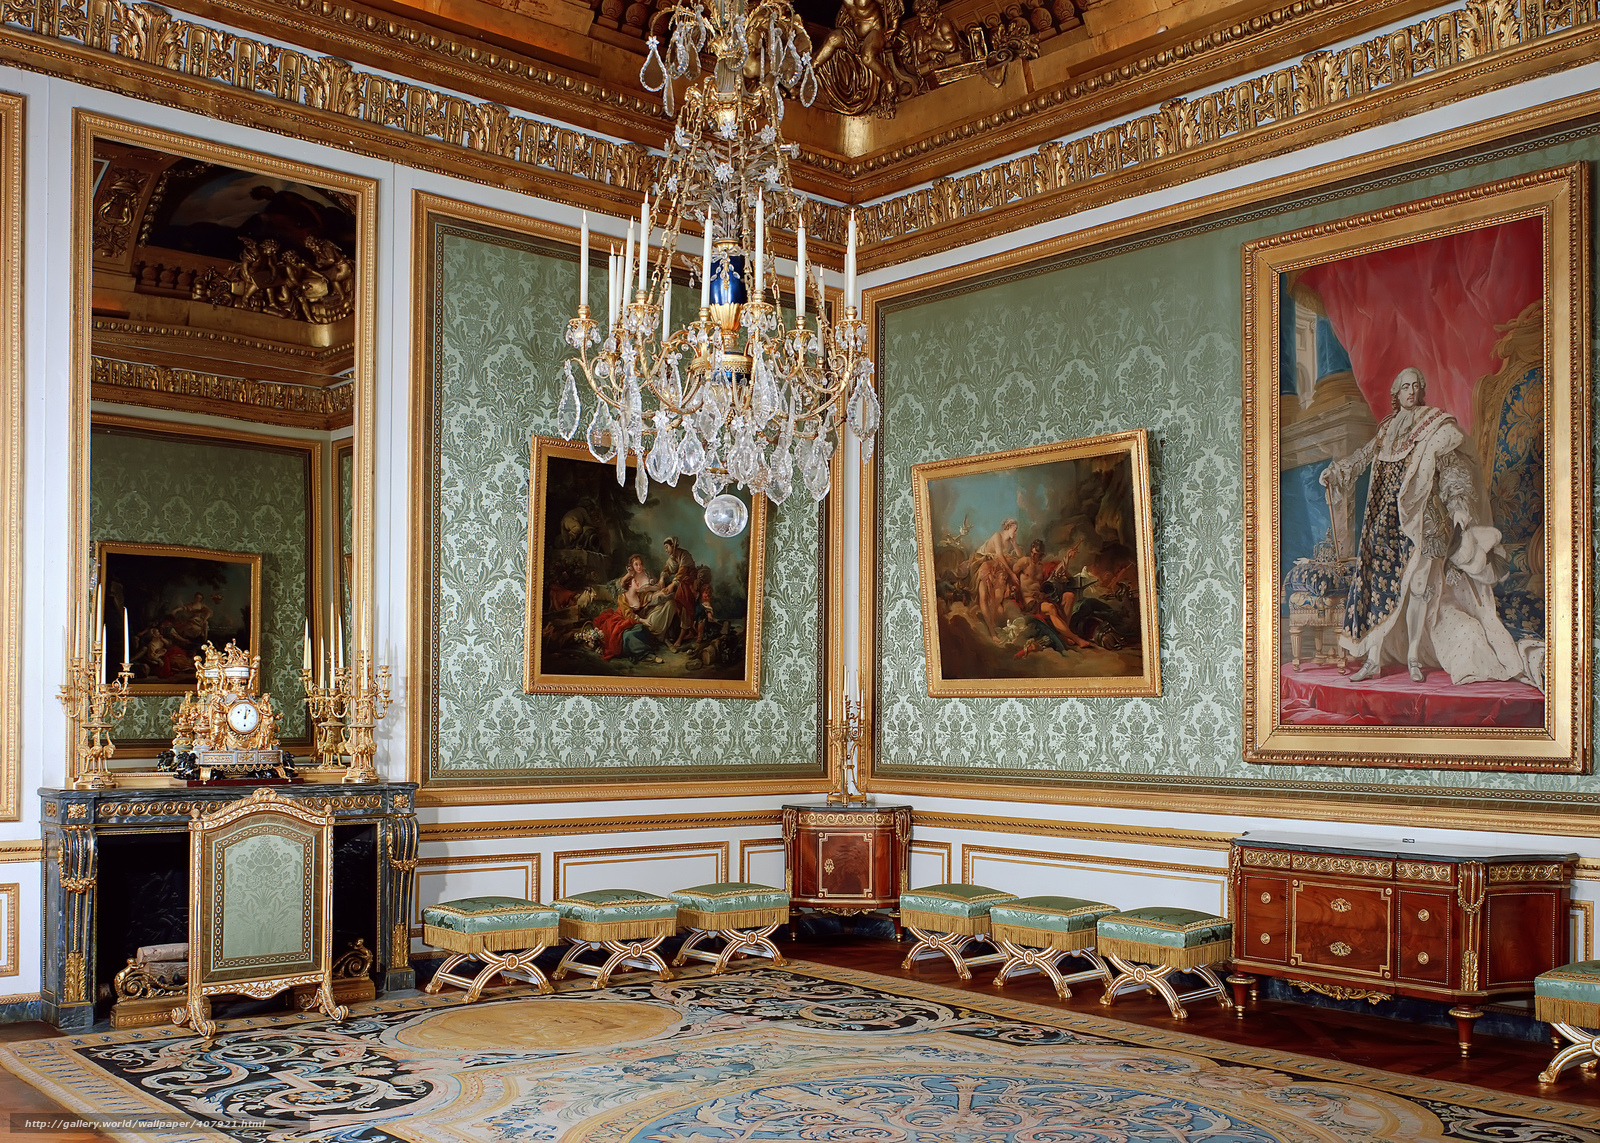 Download wallpaper france versailles palace interior for Salon de versailles 2016